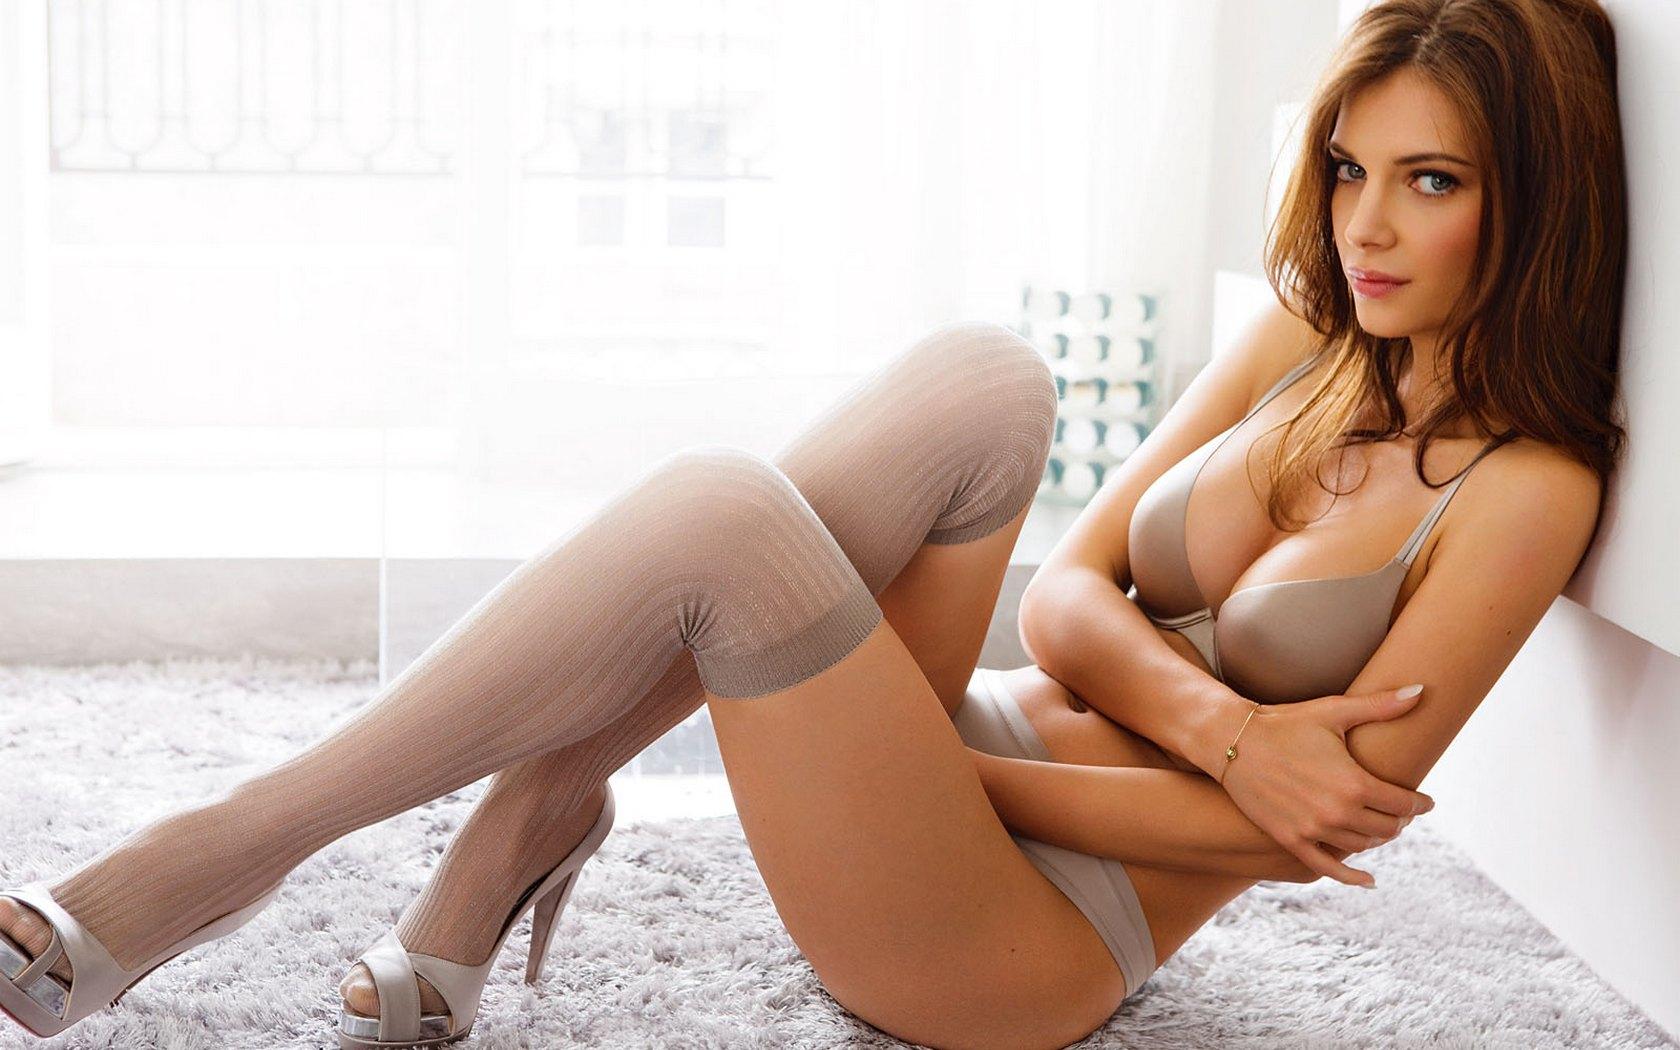 English xxx saxy hot movi nude streaming